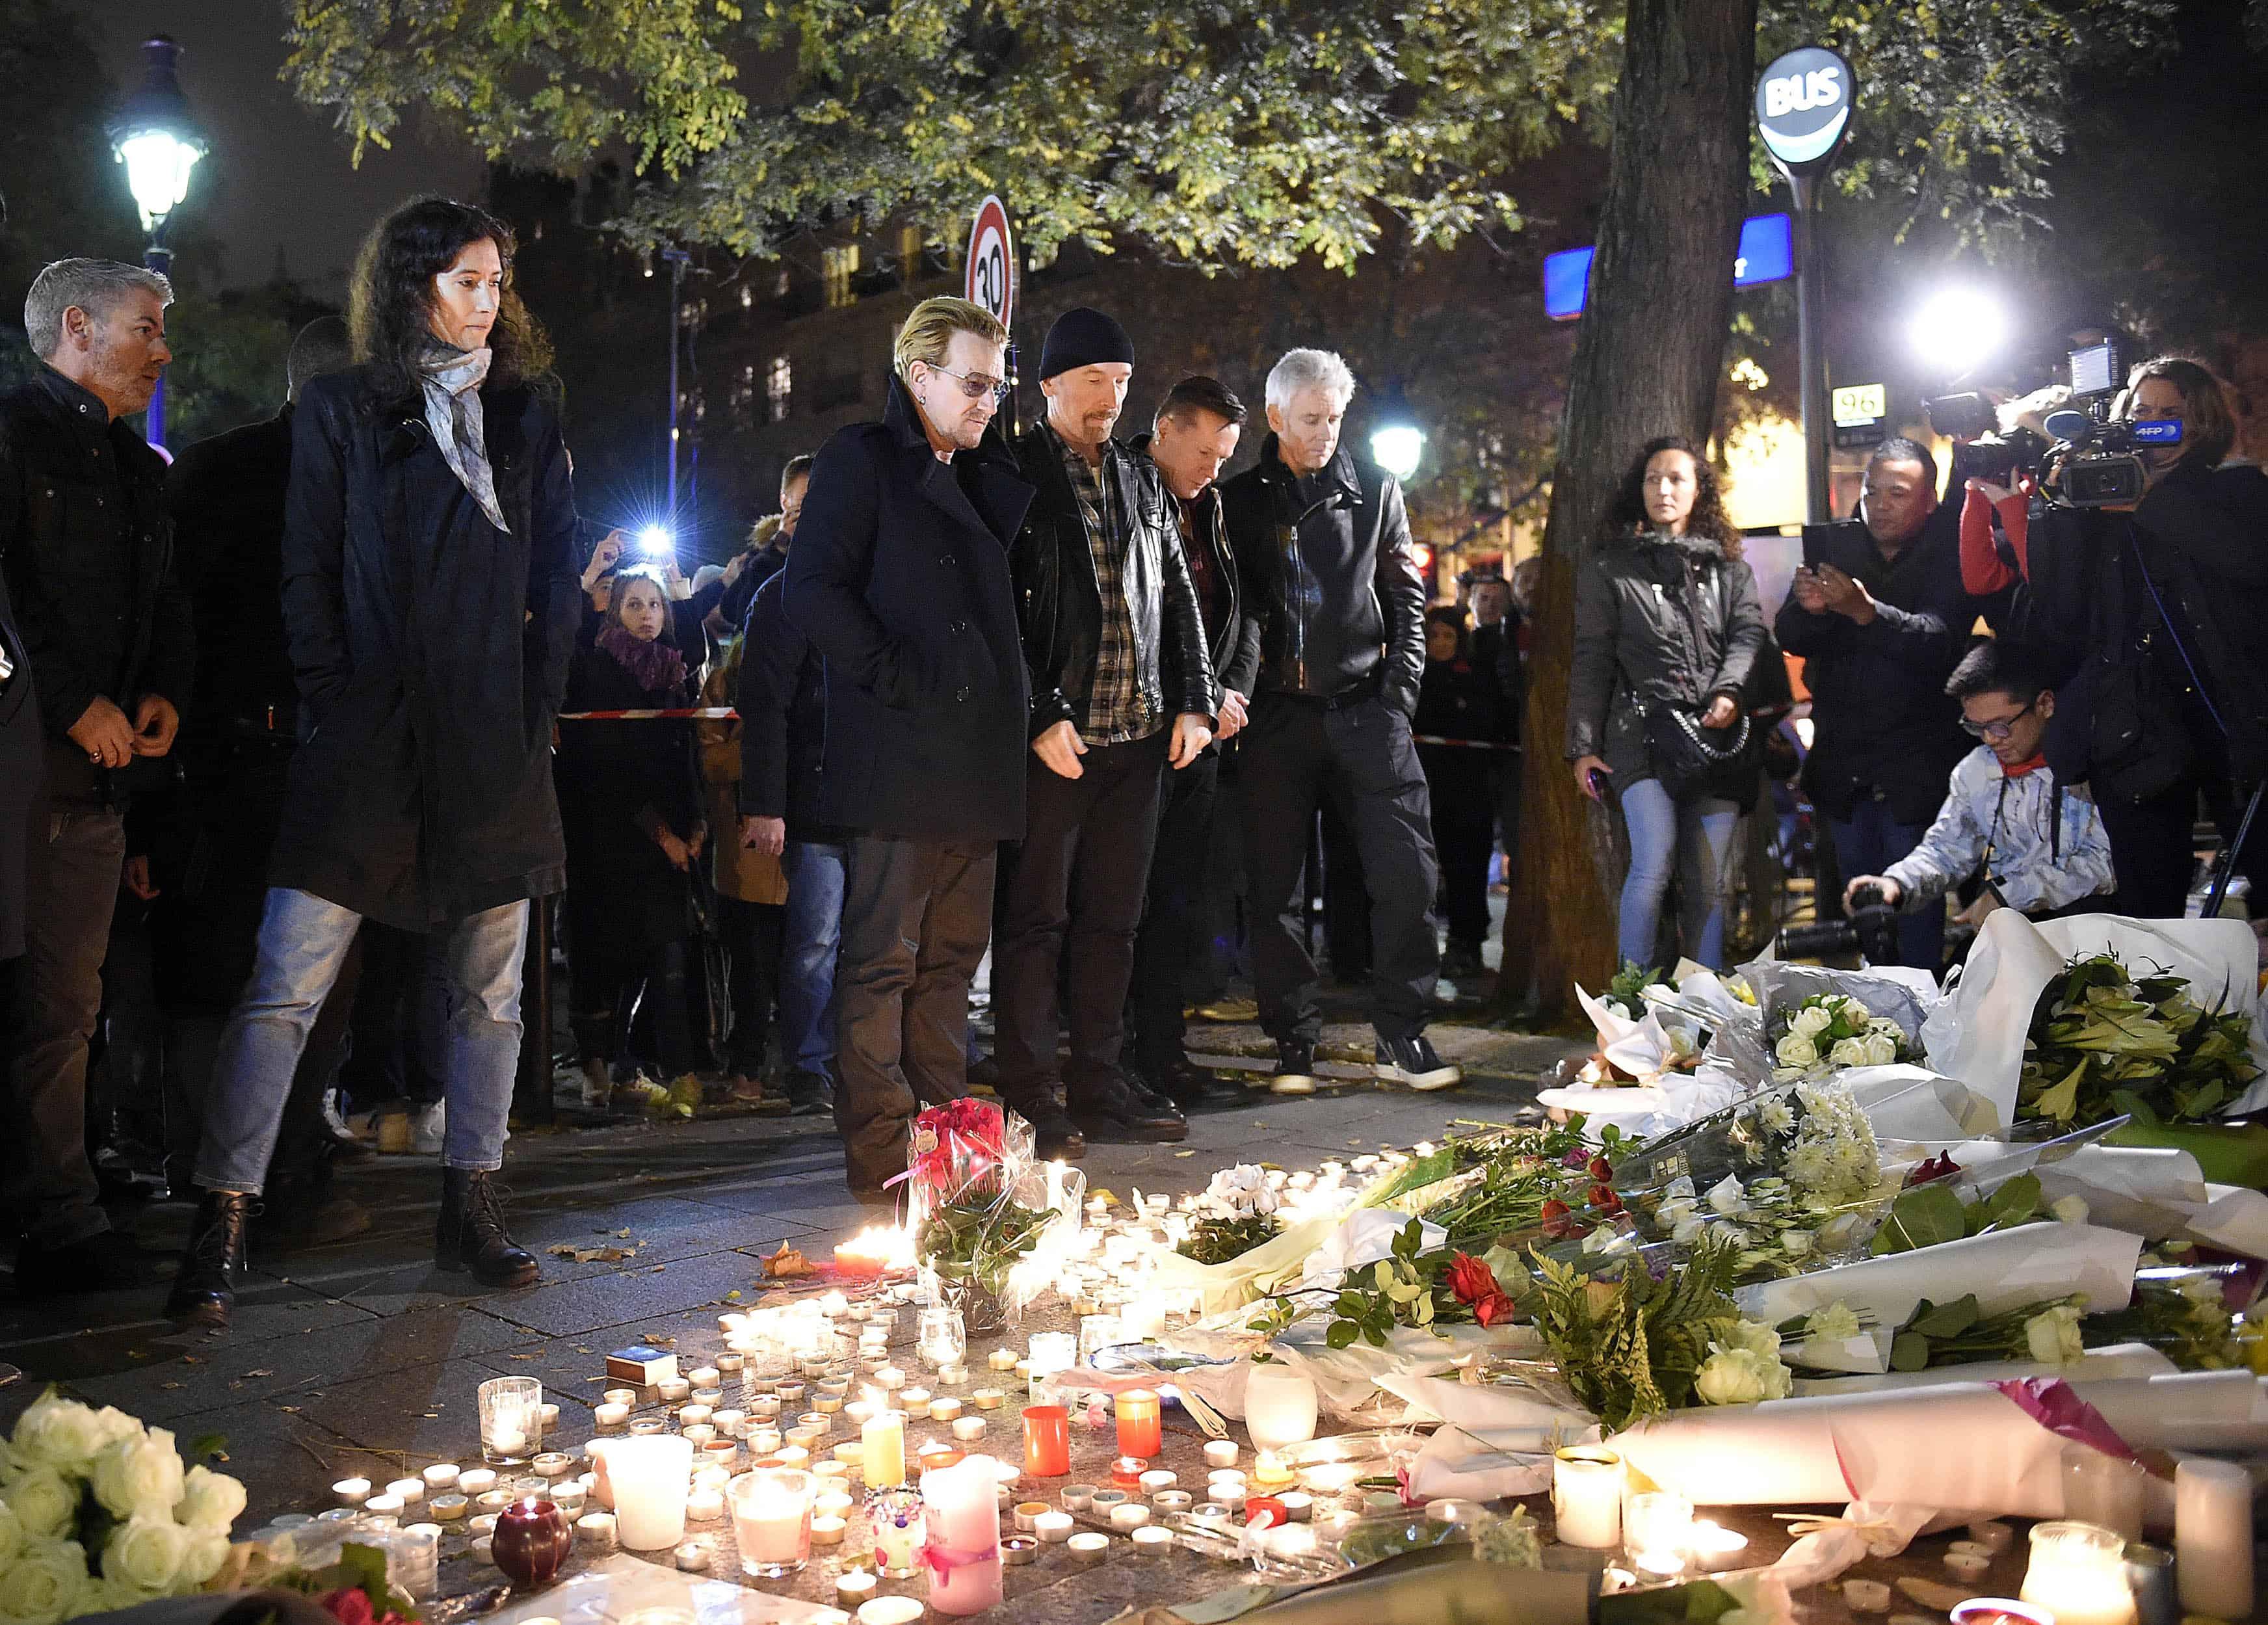 U2 in Paris after attacks